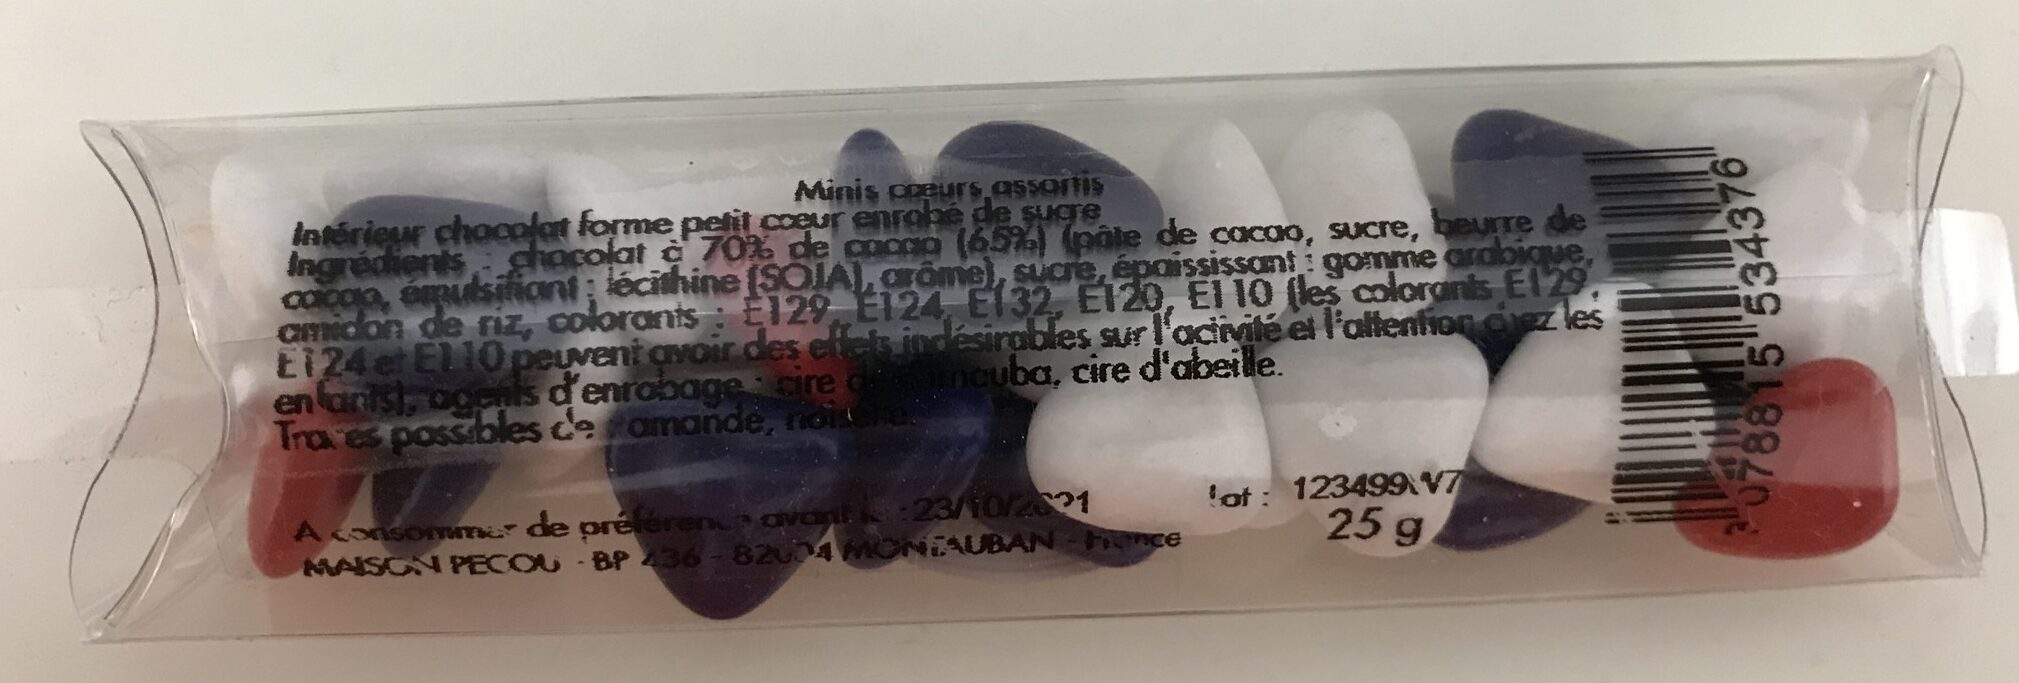 Minis cœurs assortis - Voedingswaarden